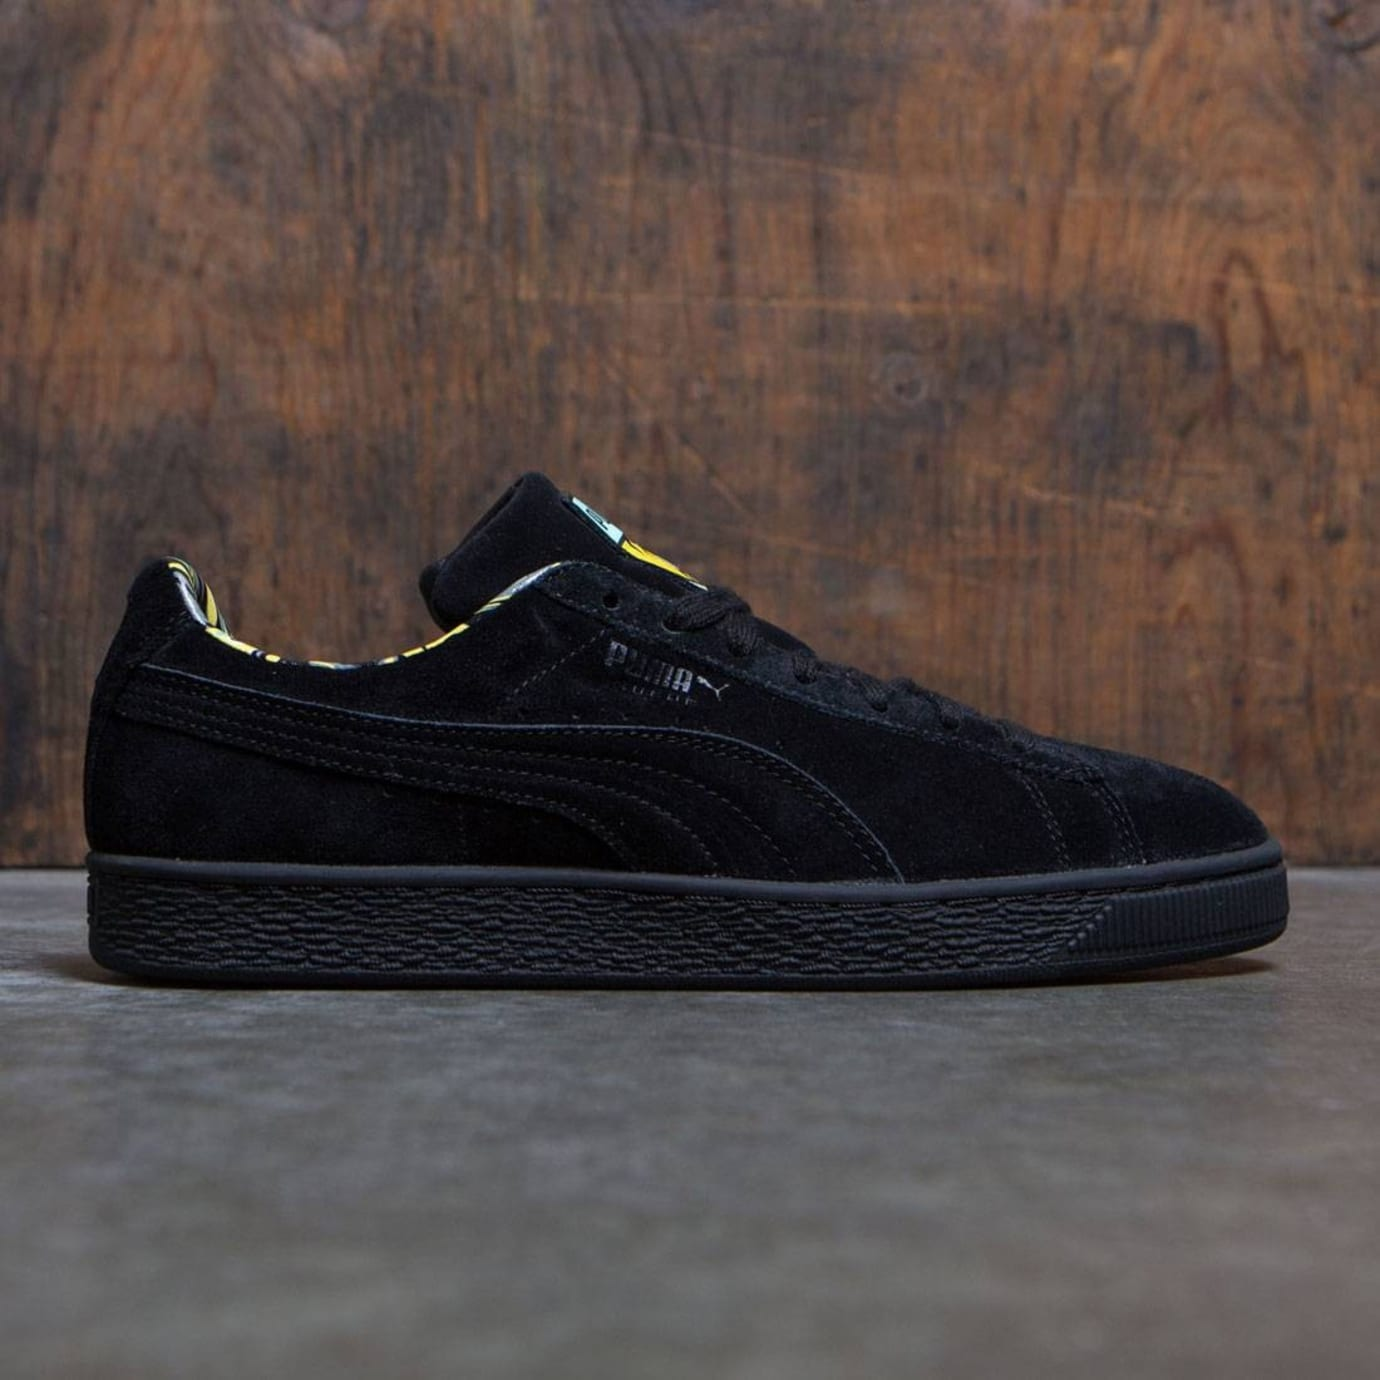 c488ea7c33c2 Puma x Minions  Despicable Me  Sneakers Available